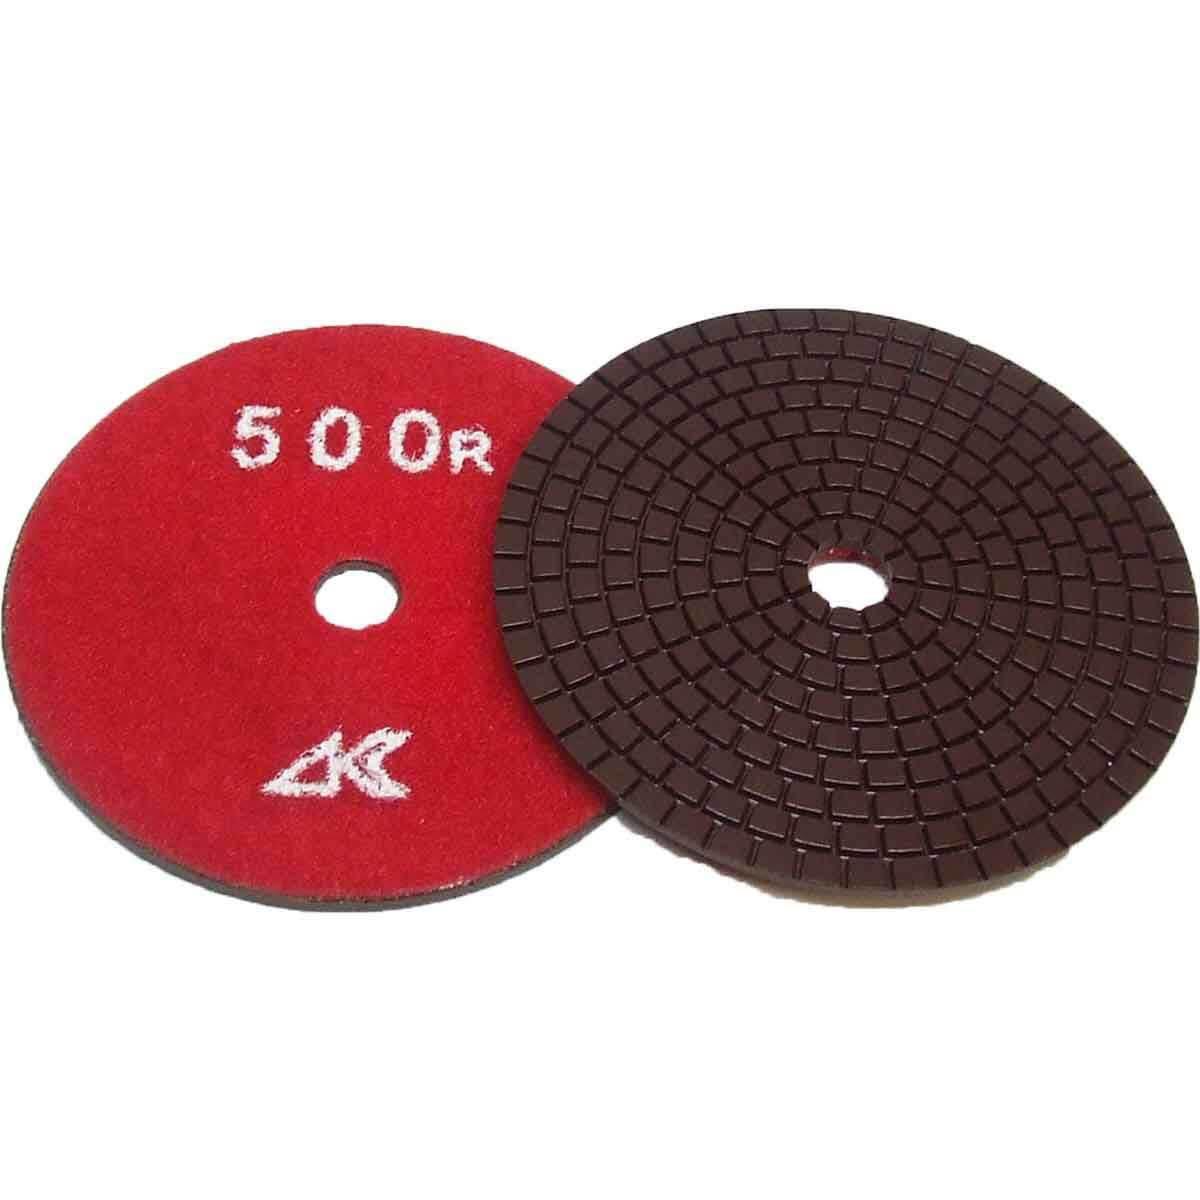 GP40500R 500 Grit Wet Stone Pads